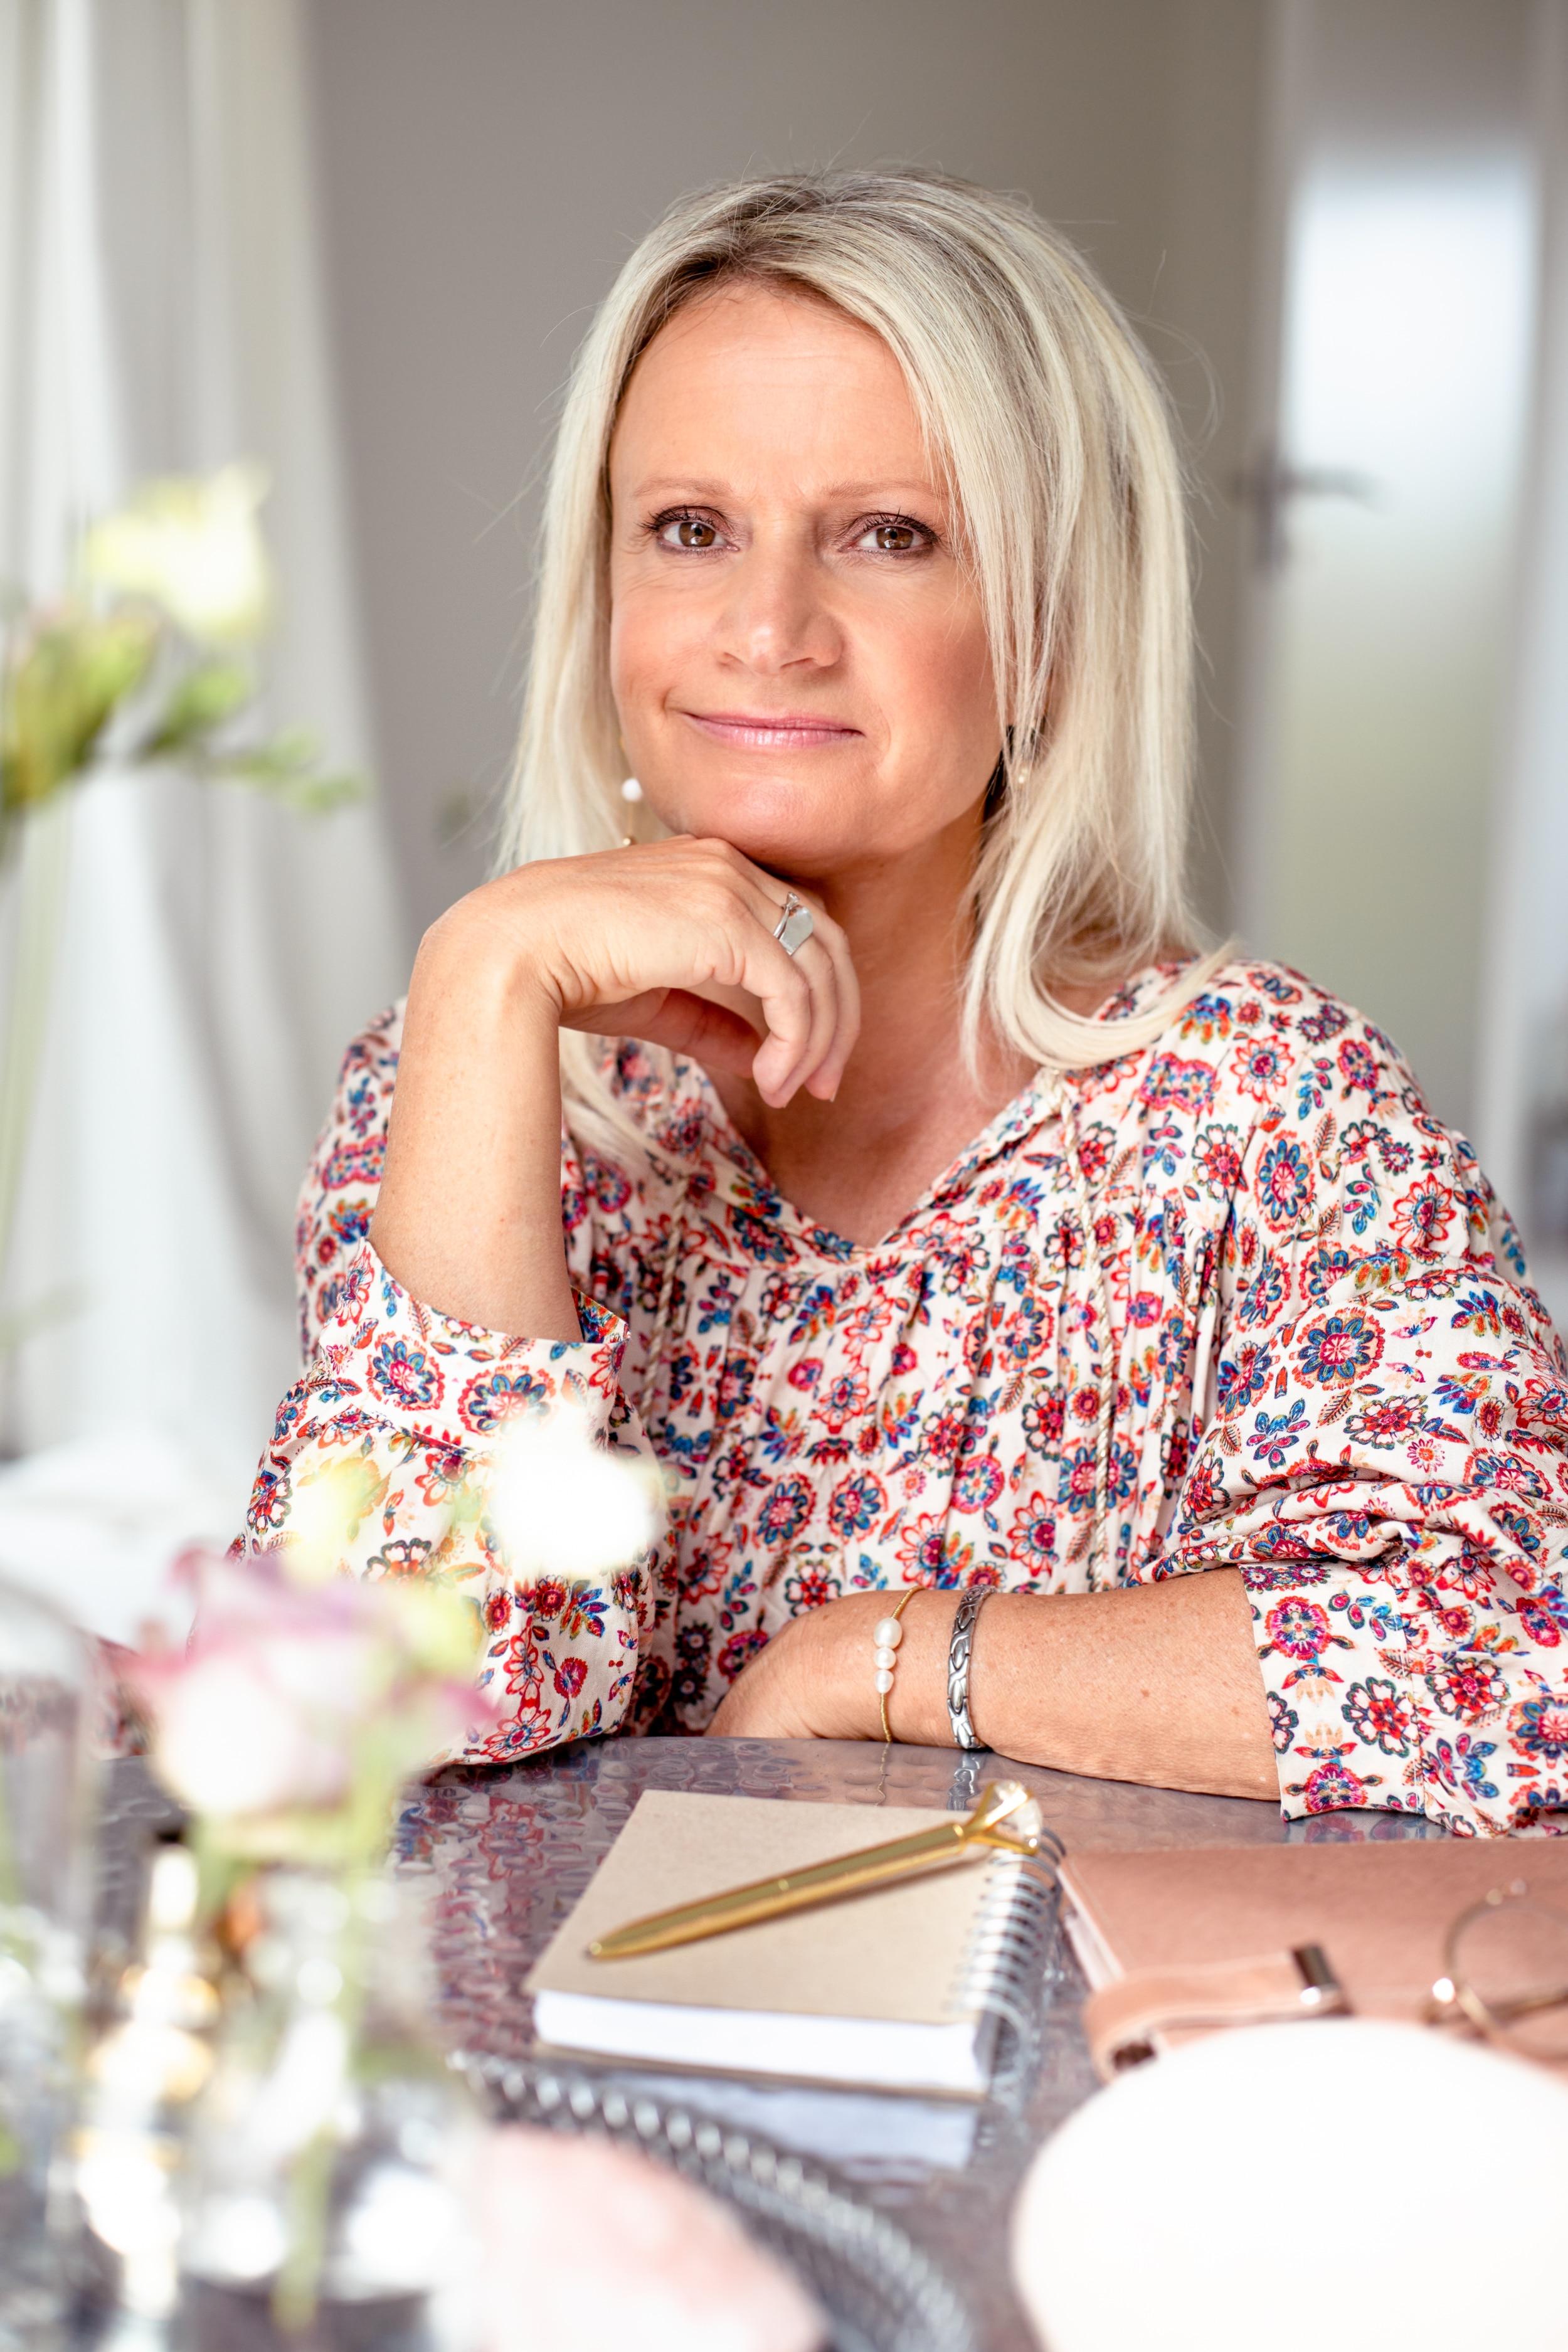 psykoterapi Fyn - psykoterapi Odense - psykoterapi Svendborg - psykoterapeut odense - psykoterapeut tranekær - psykoterapeut langeland - psykoterapeut fyn